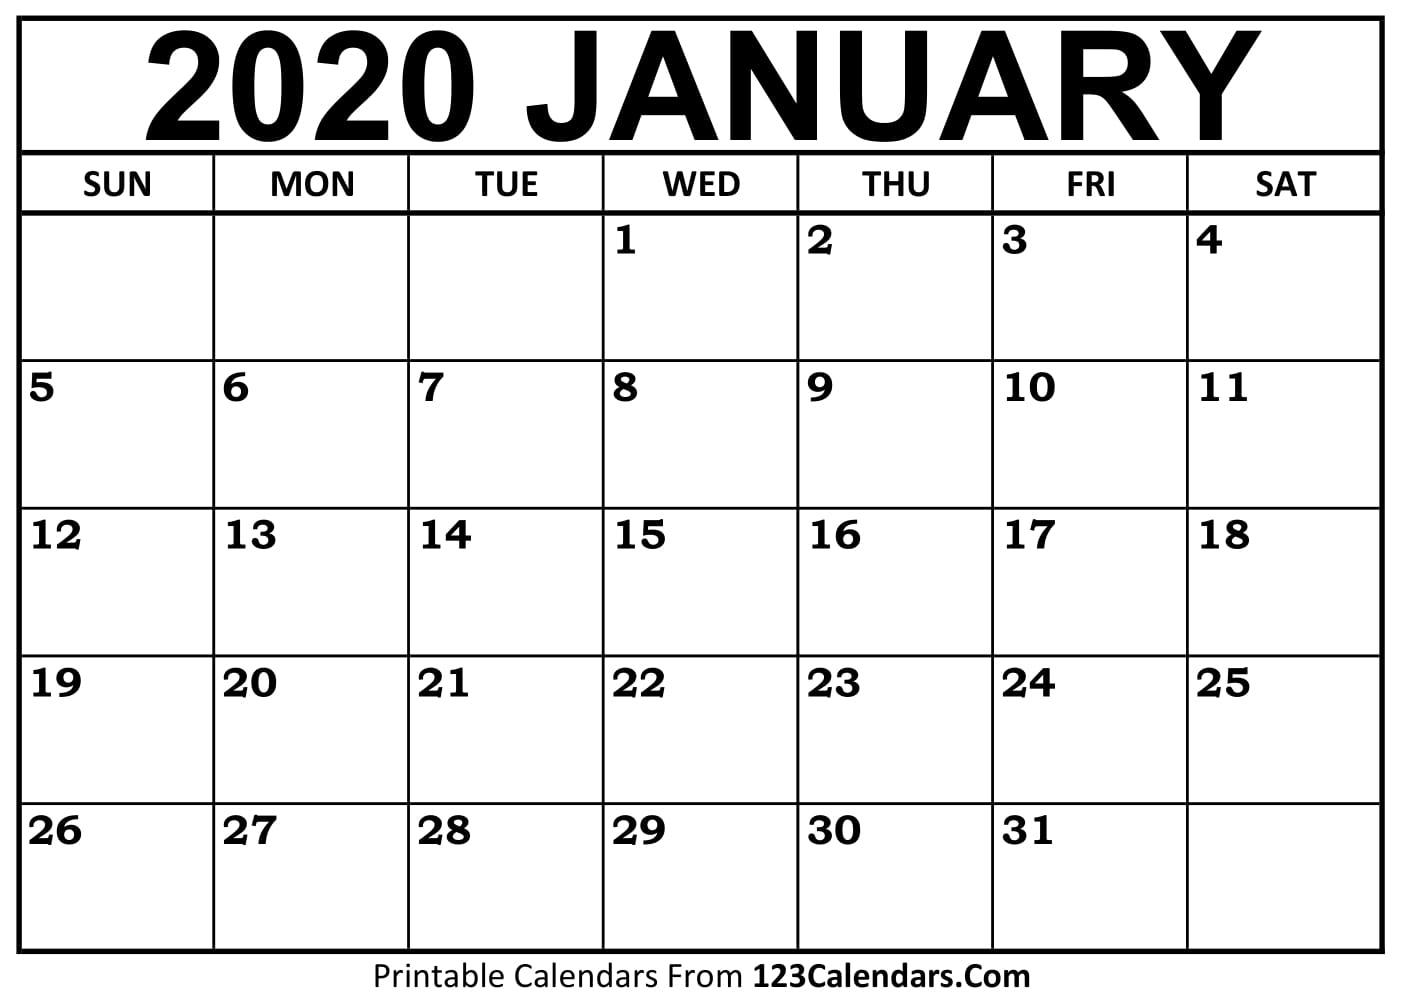 Free Printable Calendar | 123Calendars with regard to Calendar Printing Services Philippines